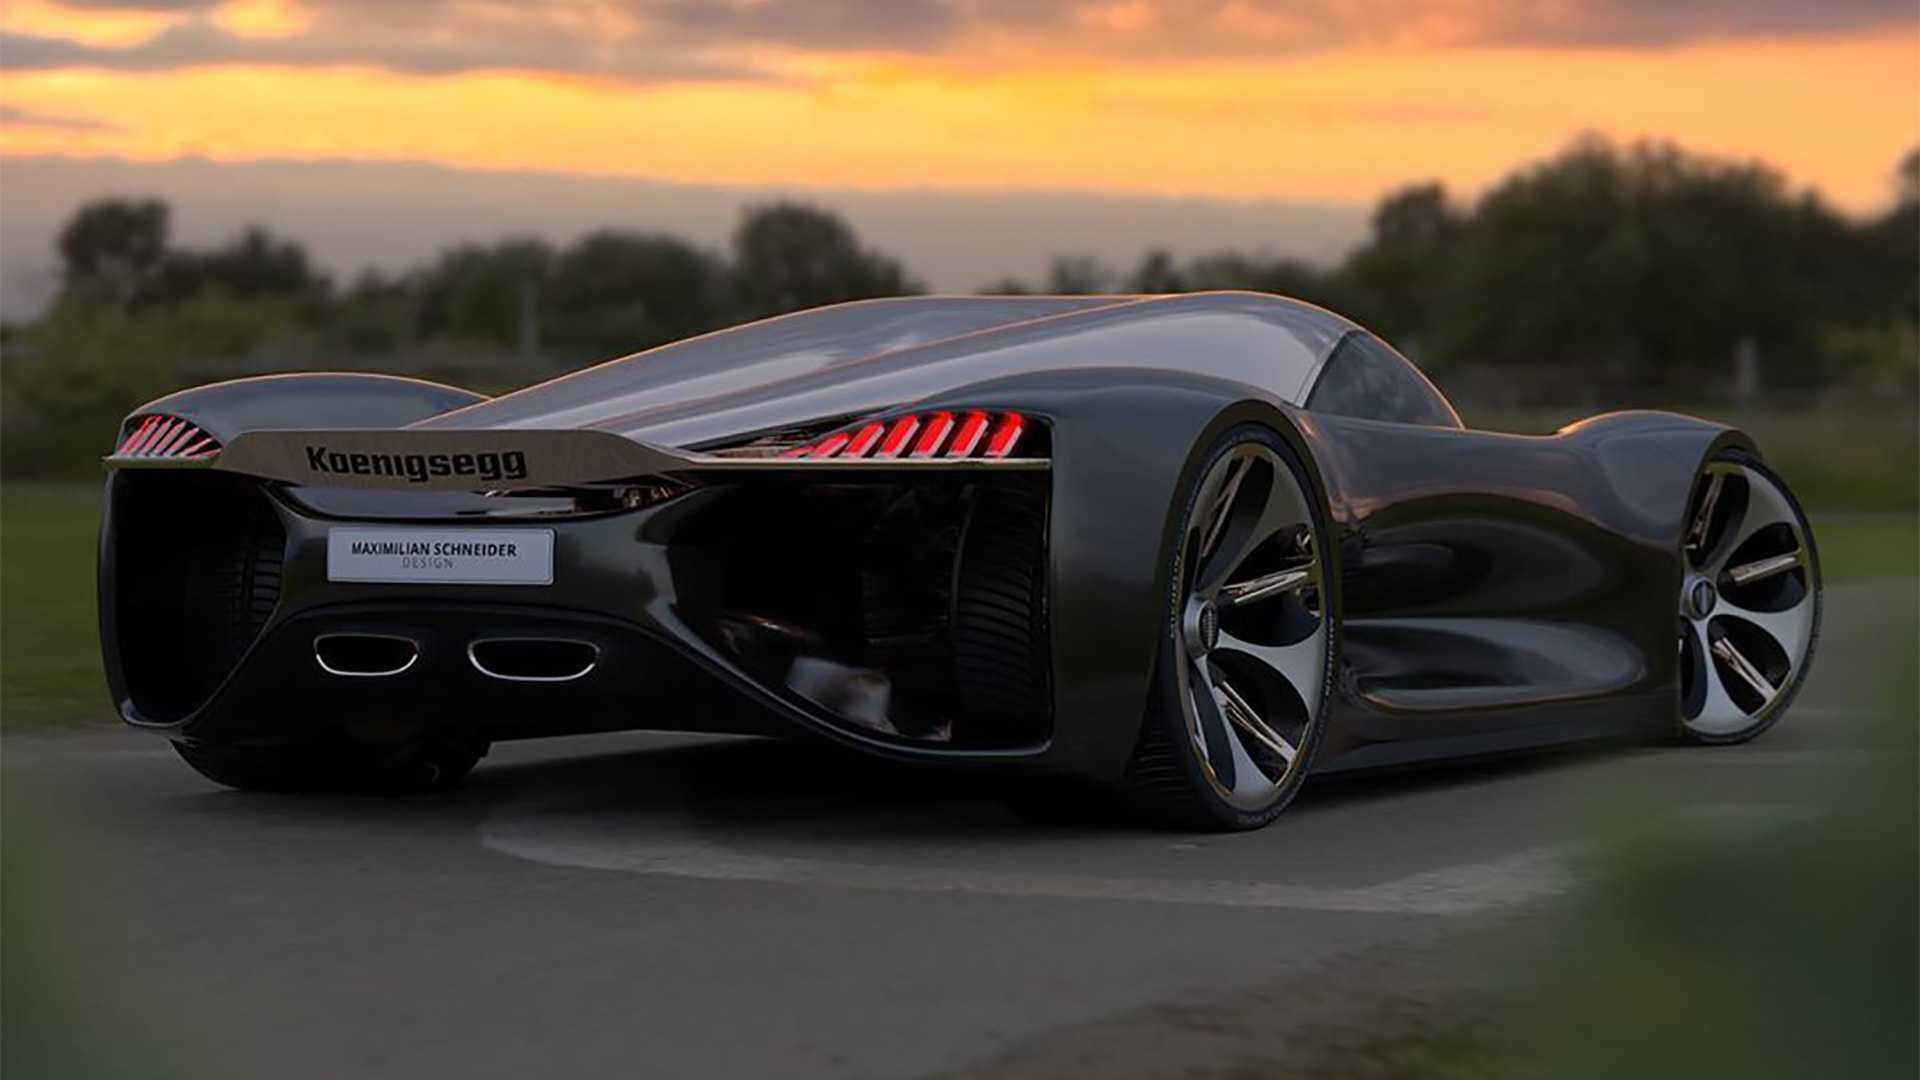 [Actualité] Les news de Koenigsegg  Koenigsegg-konigsei-concept-renderings